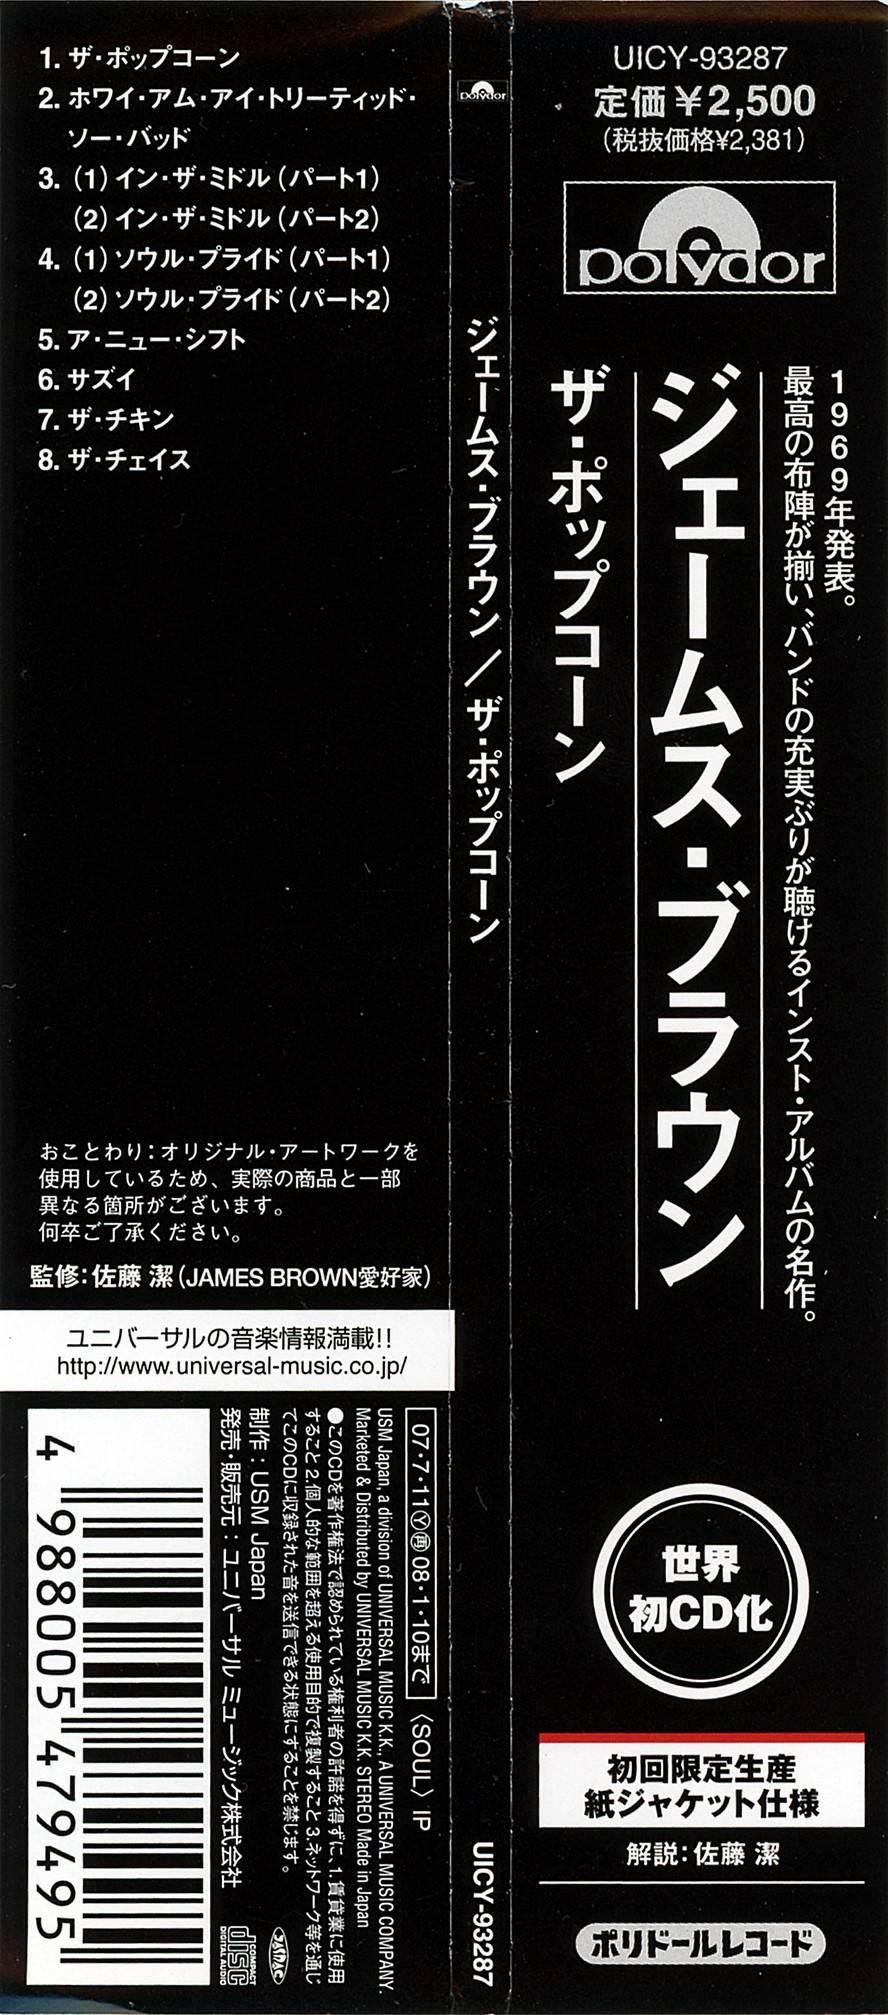 James Brown - The Popcorn (1969) {Universal Music Japan Mini LP UICY-93287 rel 2007}